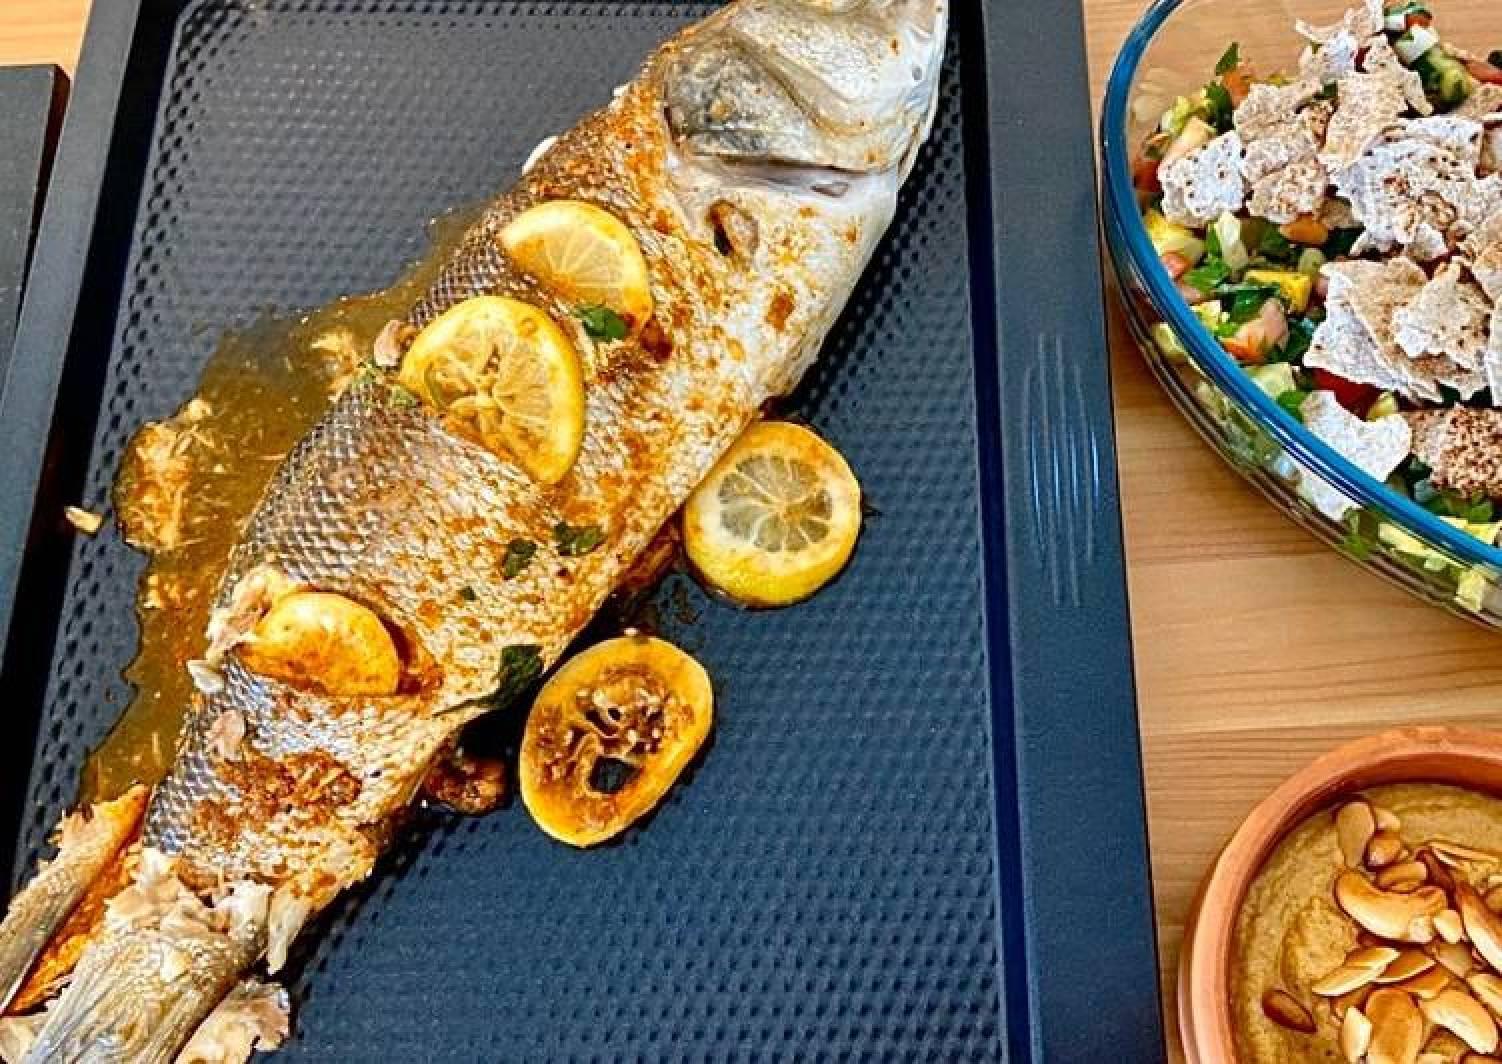 Lebanese Samkeh Harra (spicy fish)